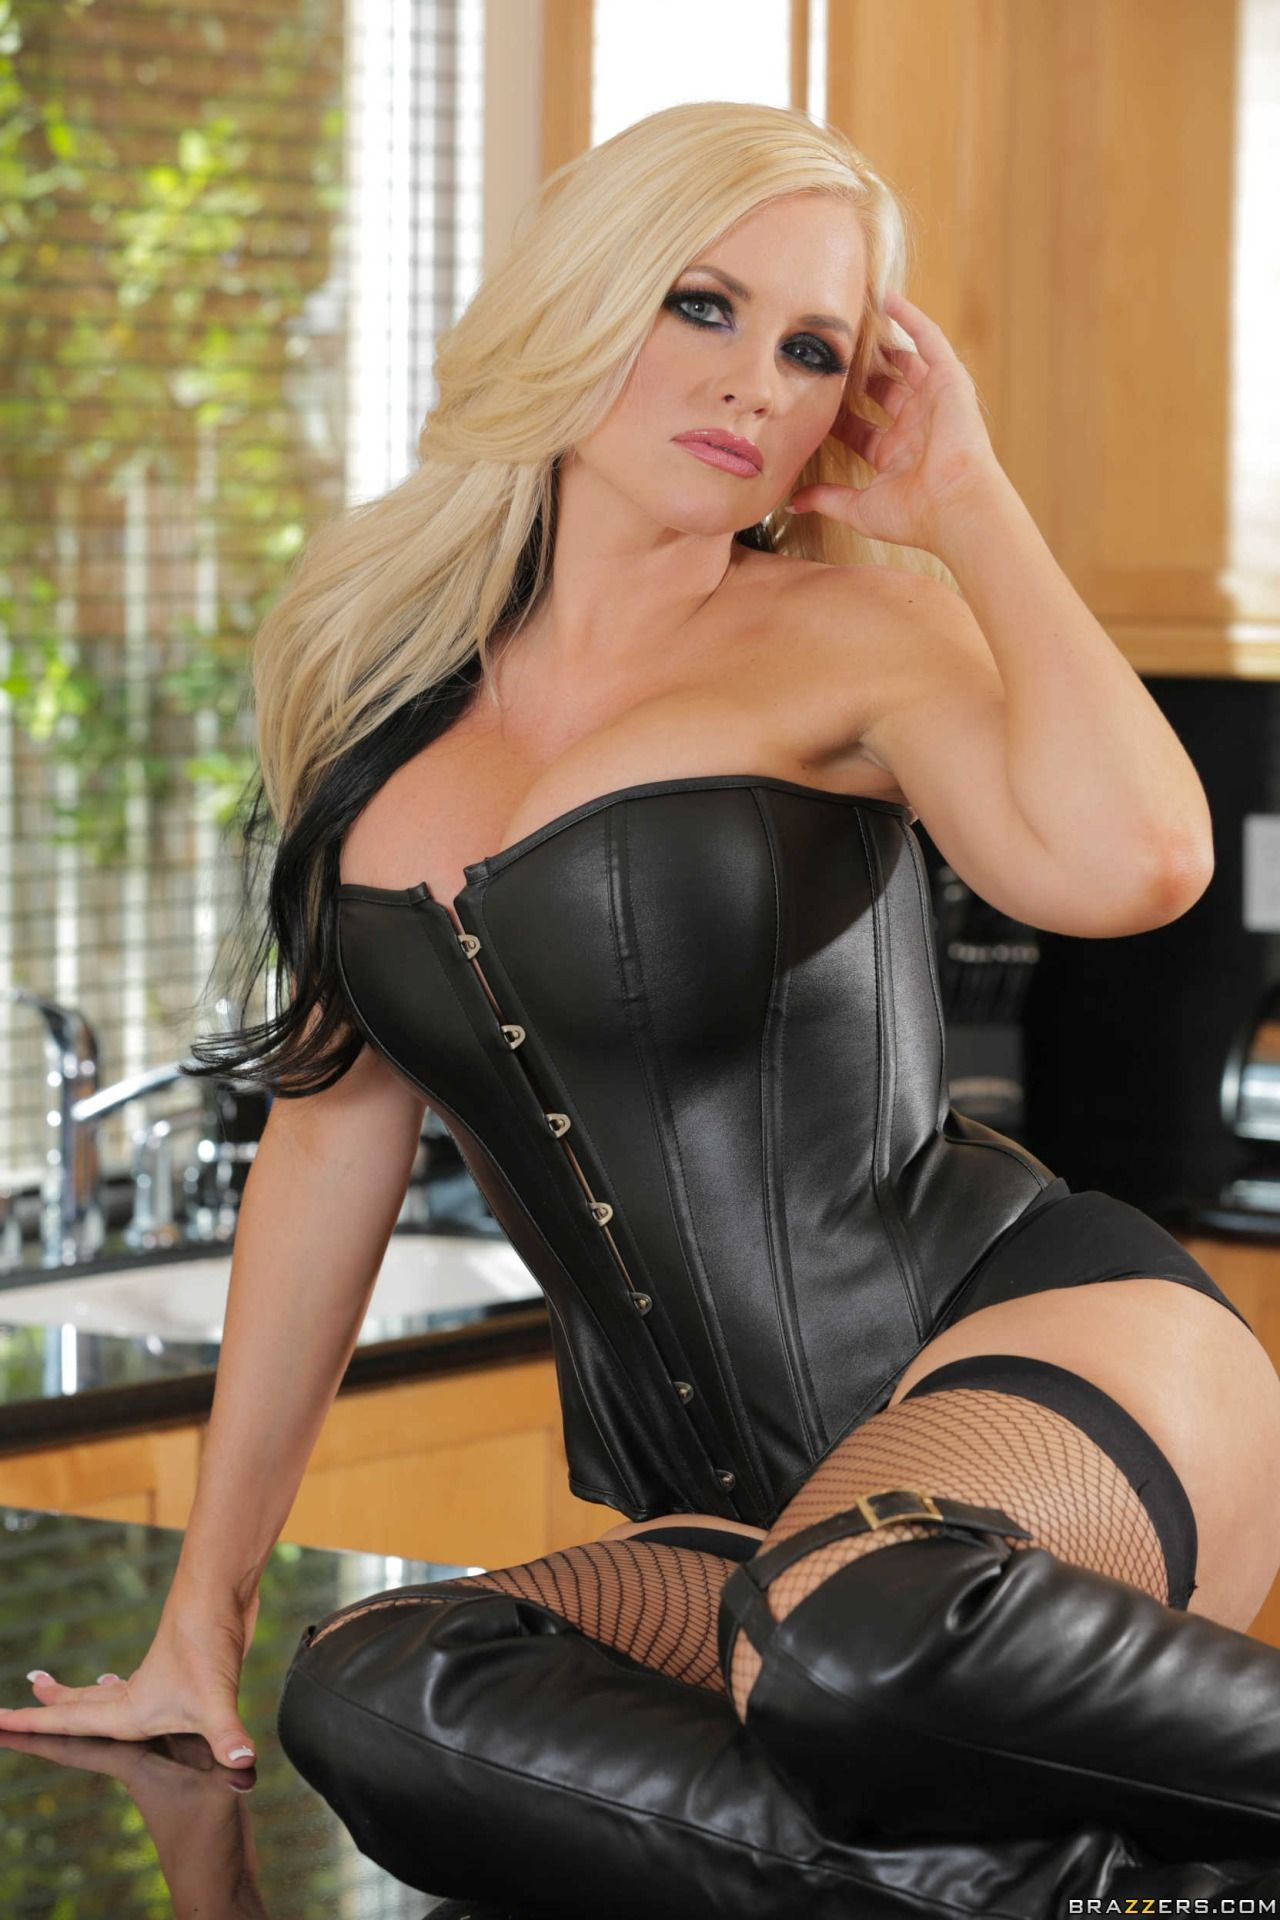 Latex corset woman transformation nails story